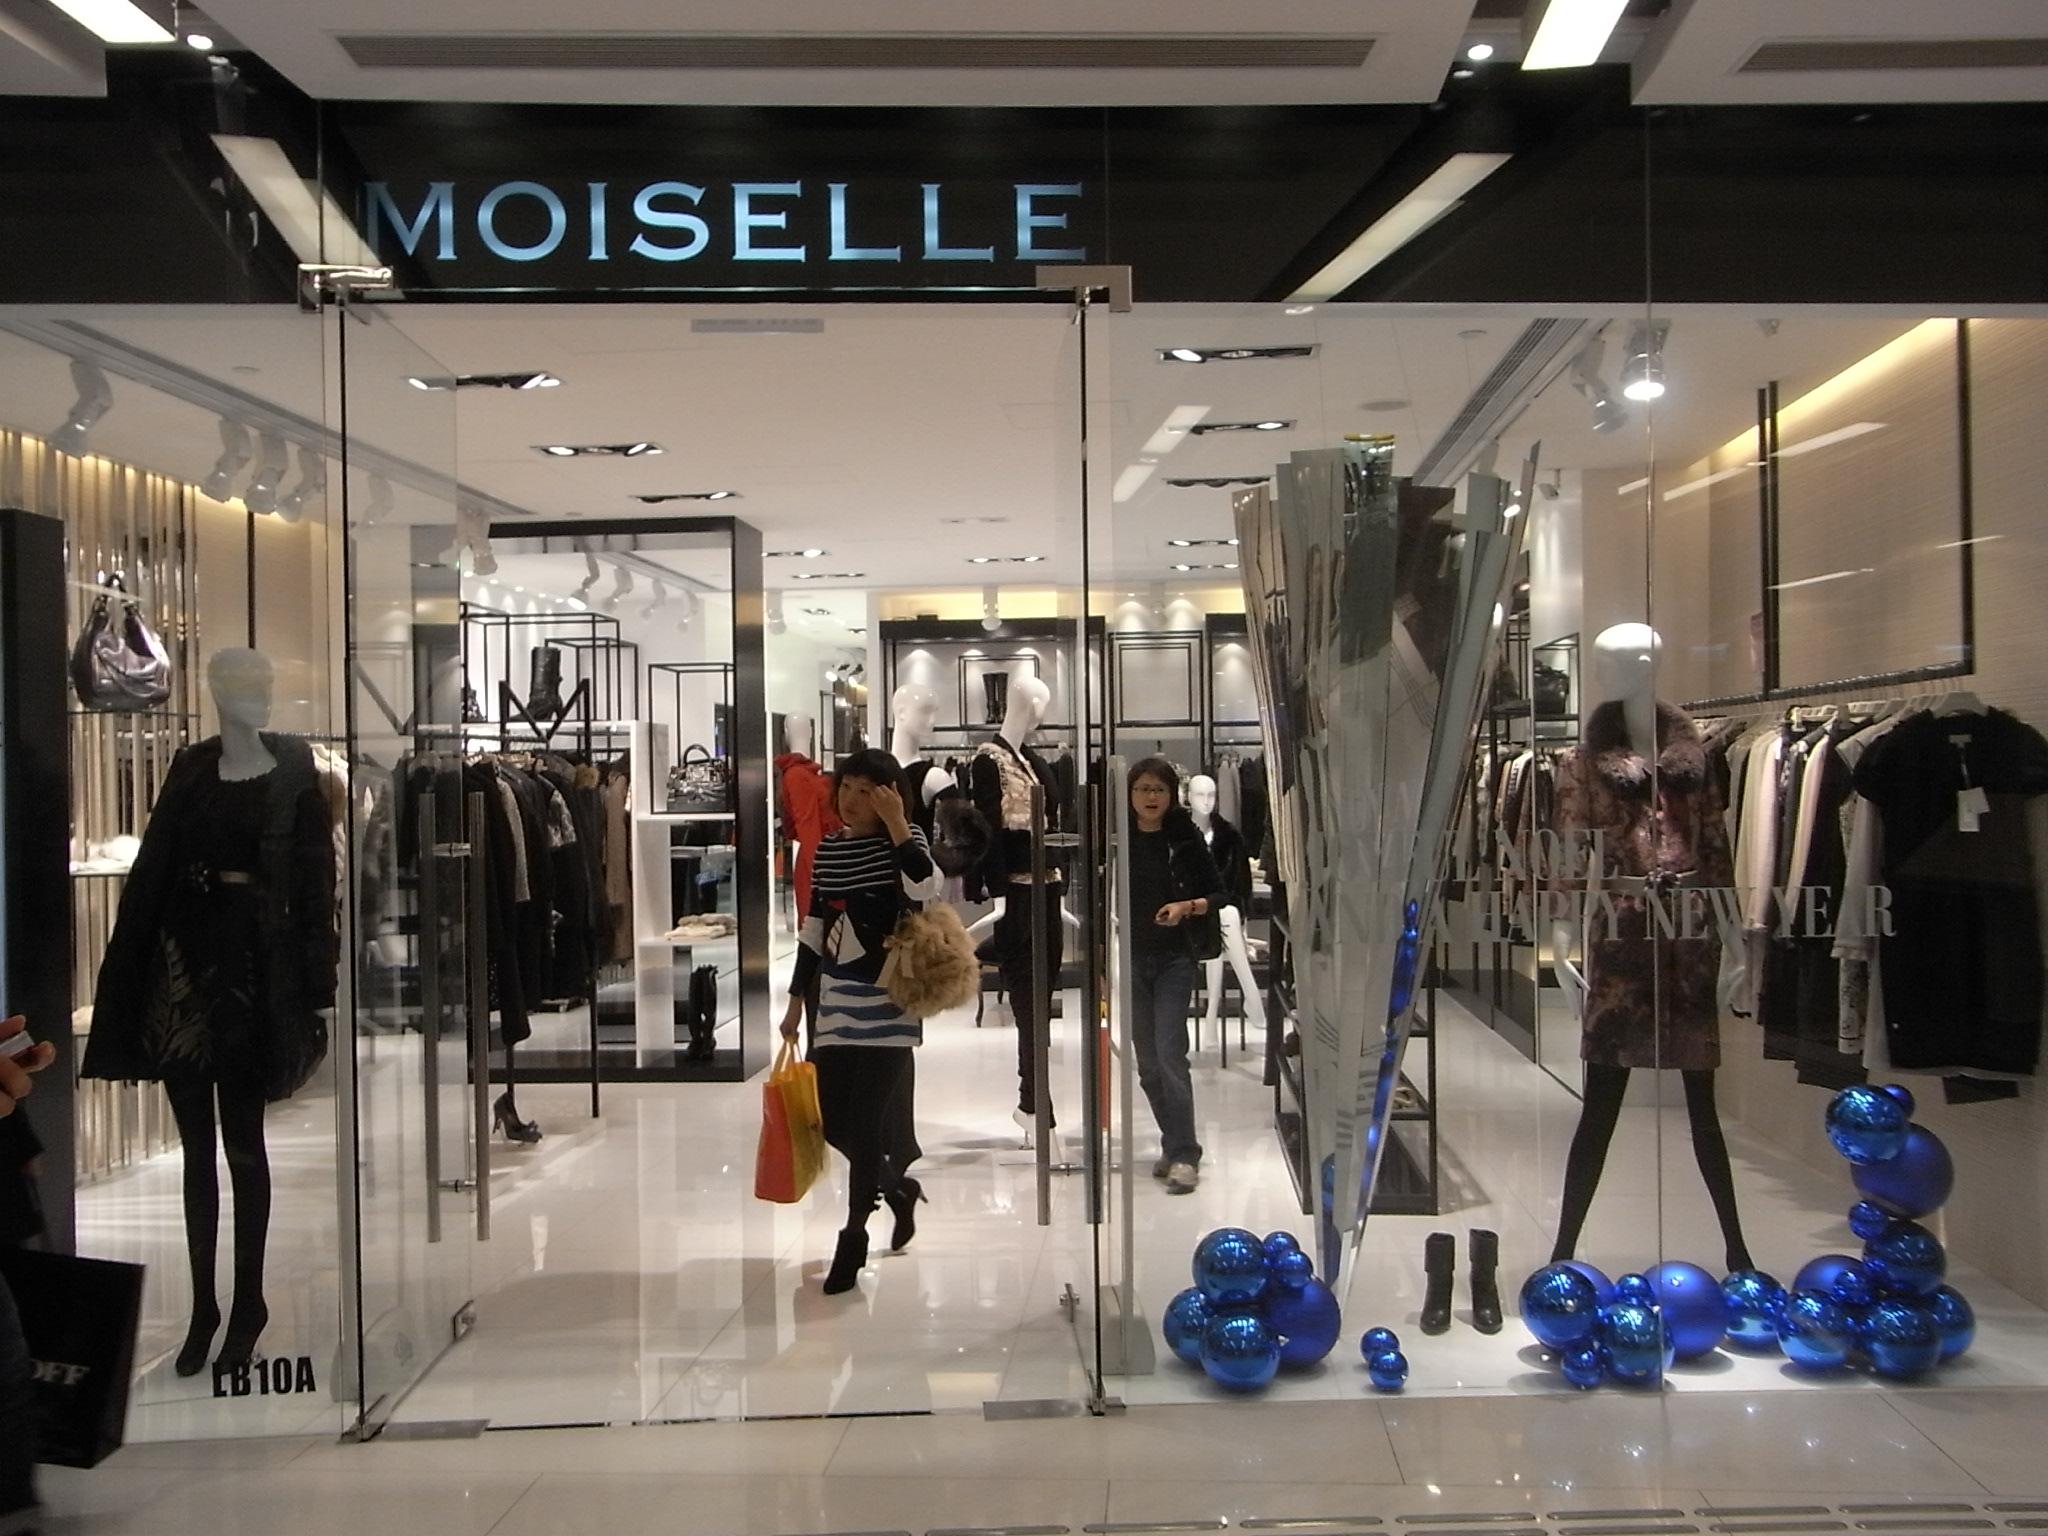 File Hk Tst Isquare Mall Clothing Shop Moiselle Jpg